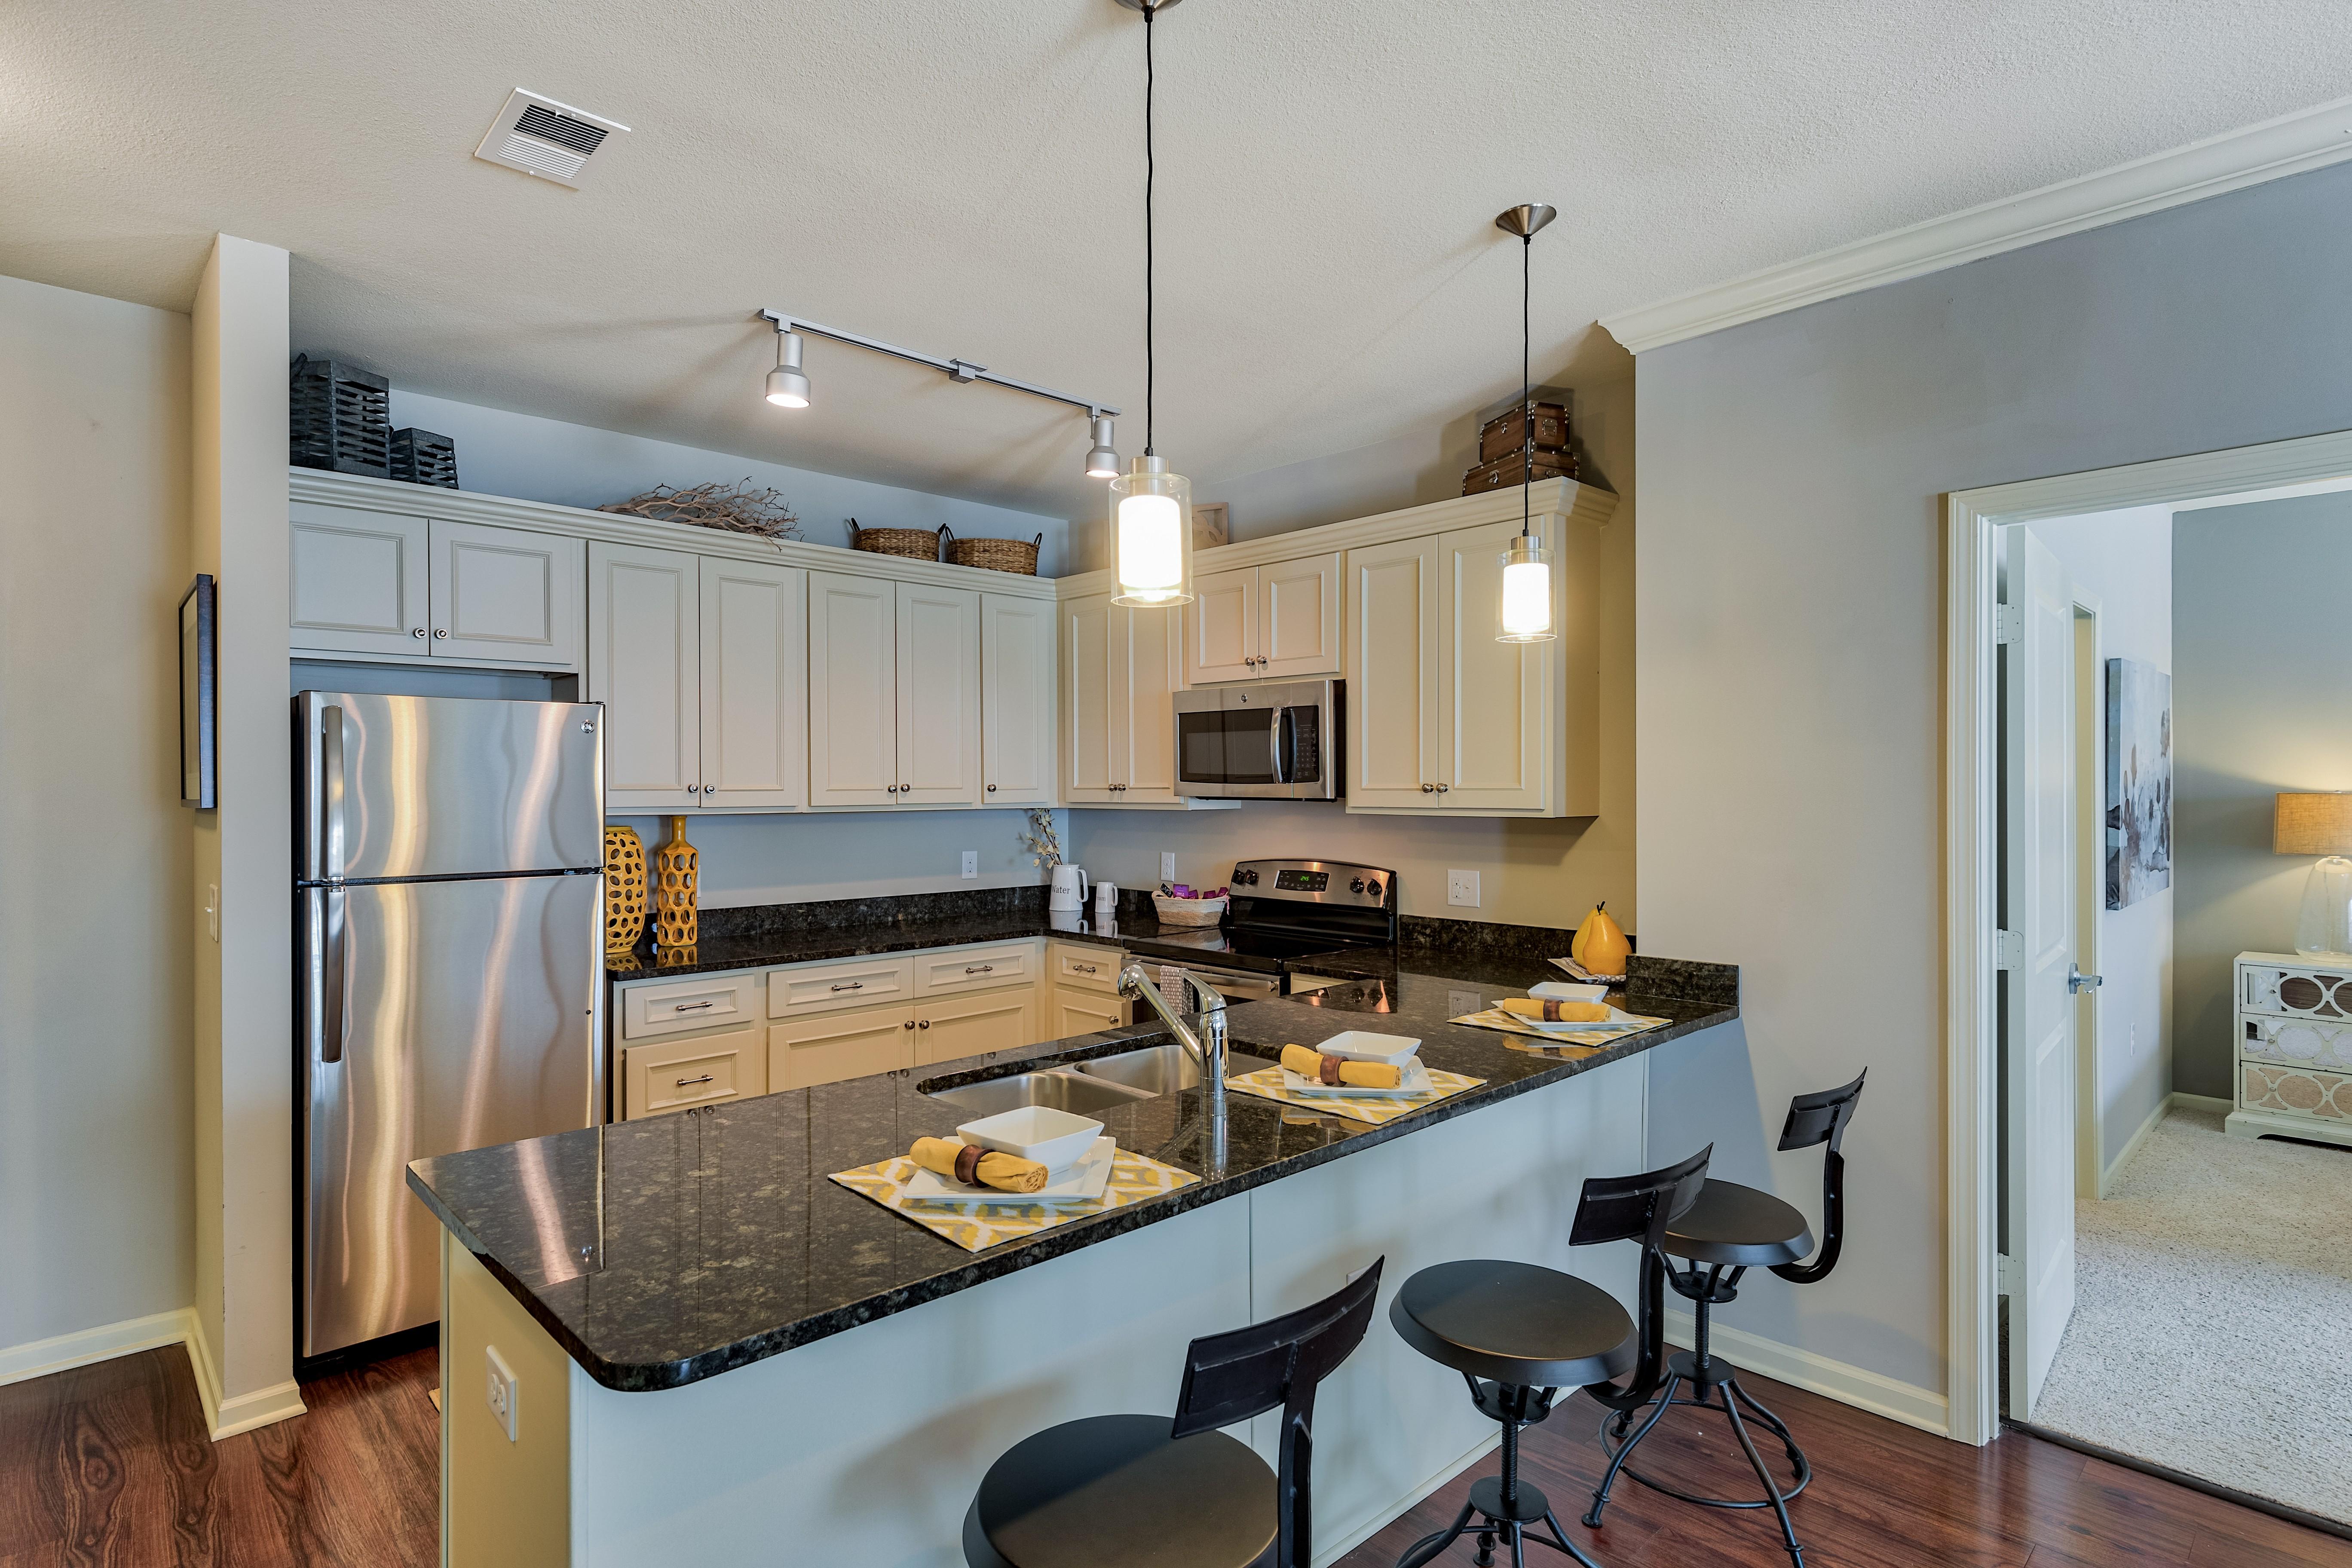 Apartments Near Grantham Village West Luxury Apartments for Grantham University Students in Kansas City, MO